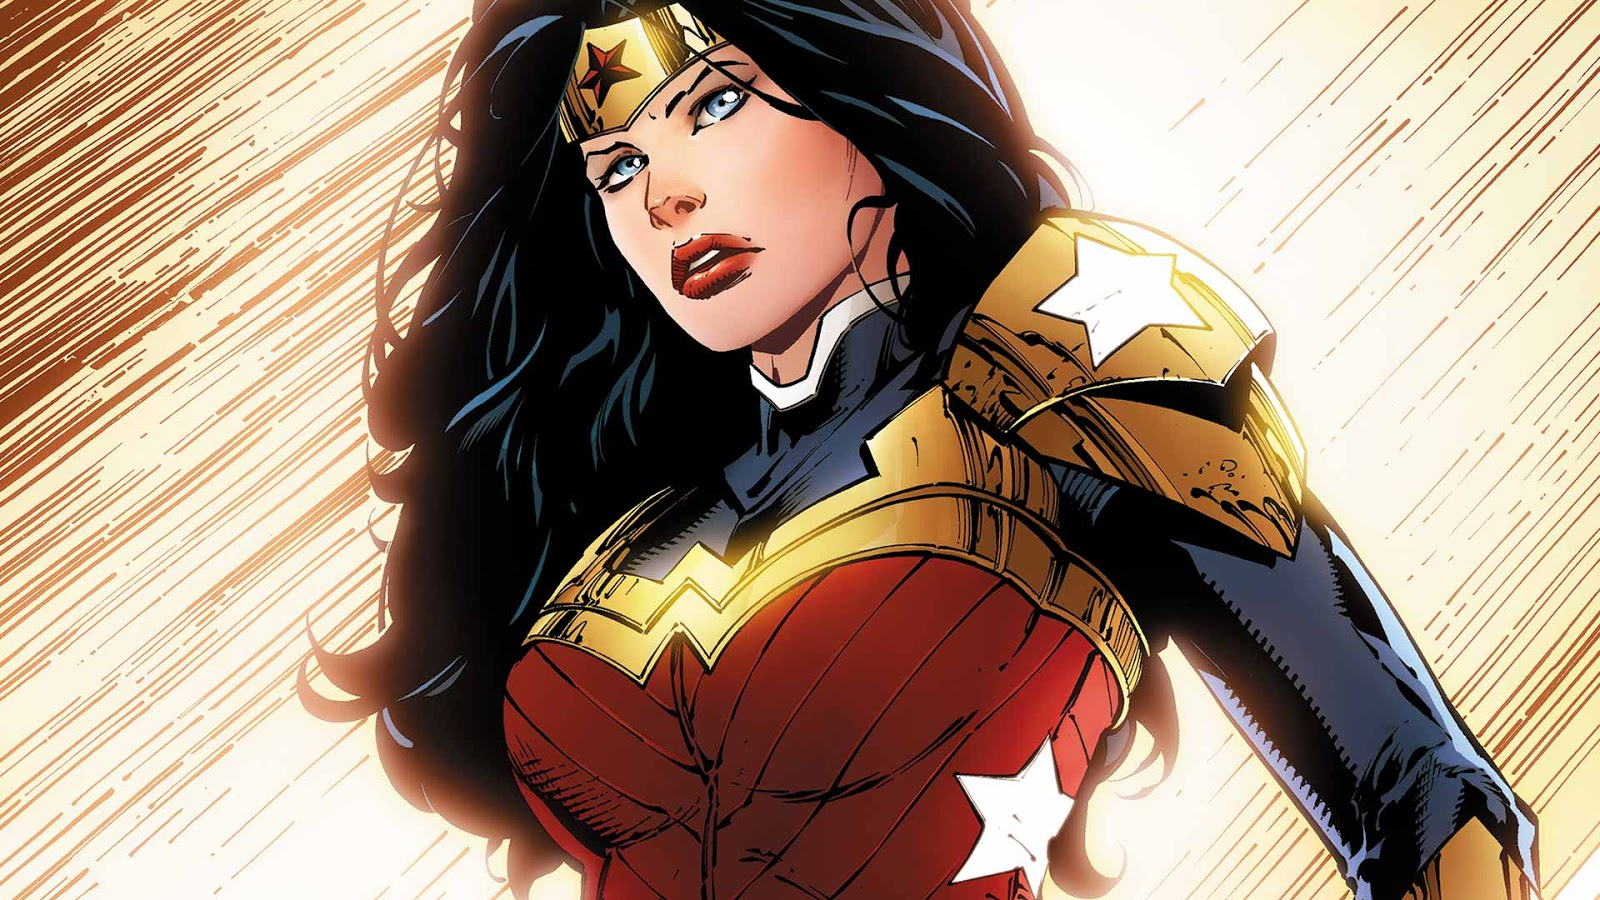 Saint Seiya Artist To Draws A Manga Based On Wonder Woman Origins